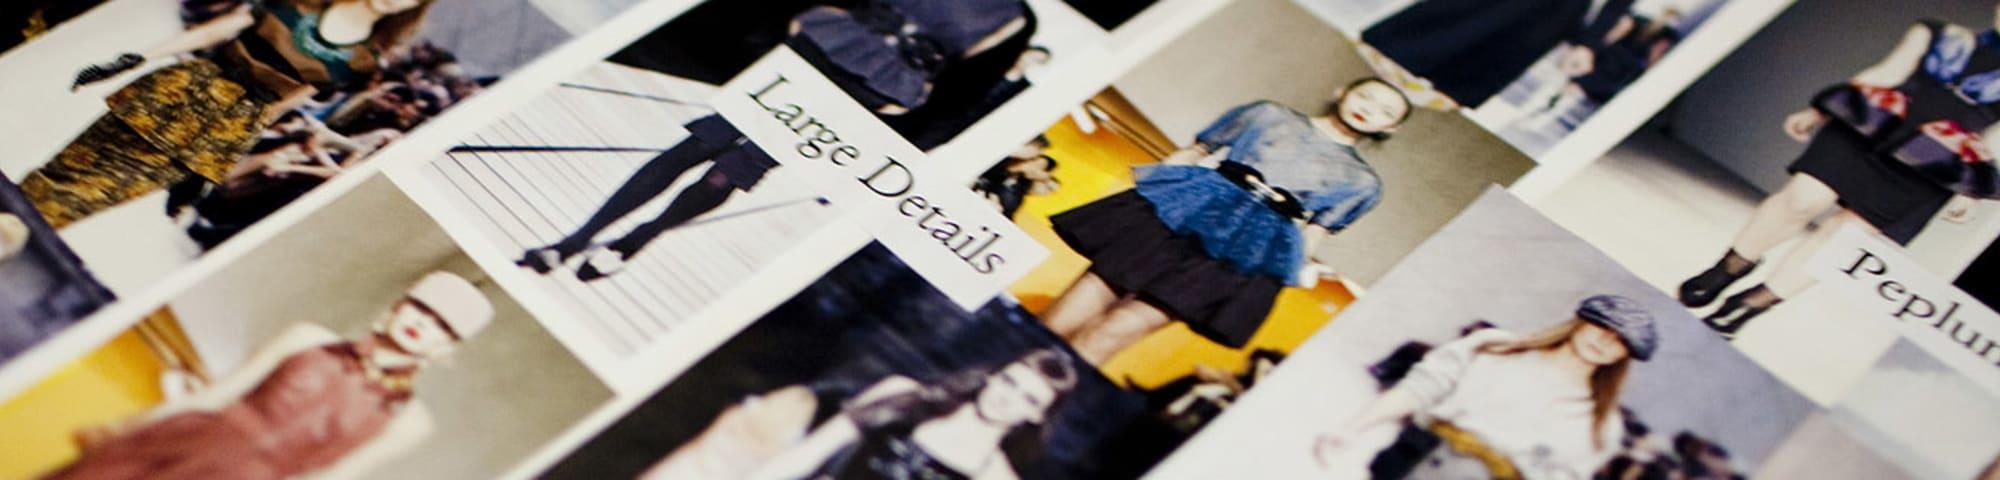 Fashion Business Semester